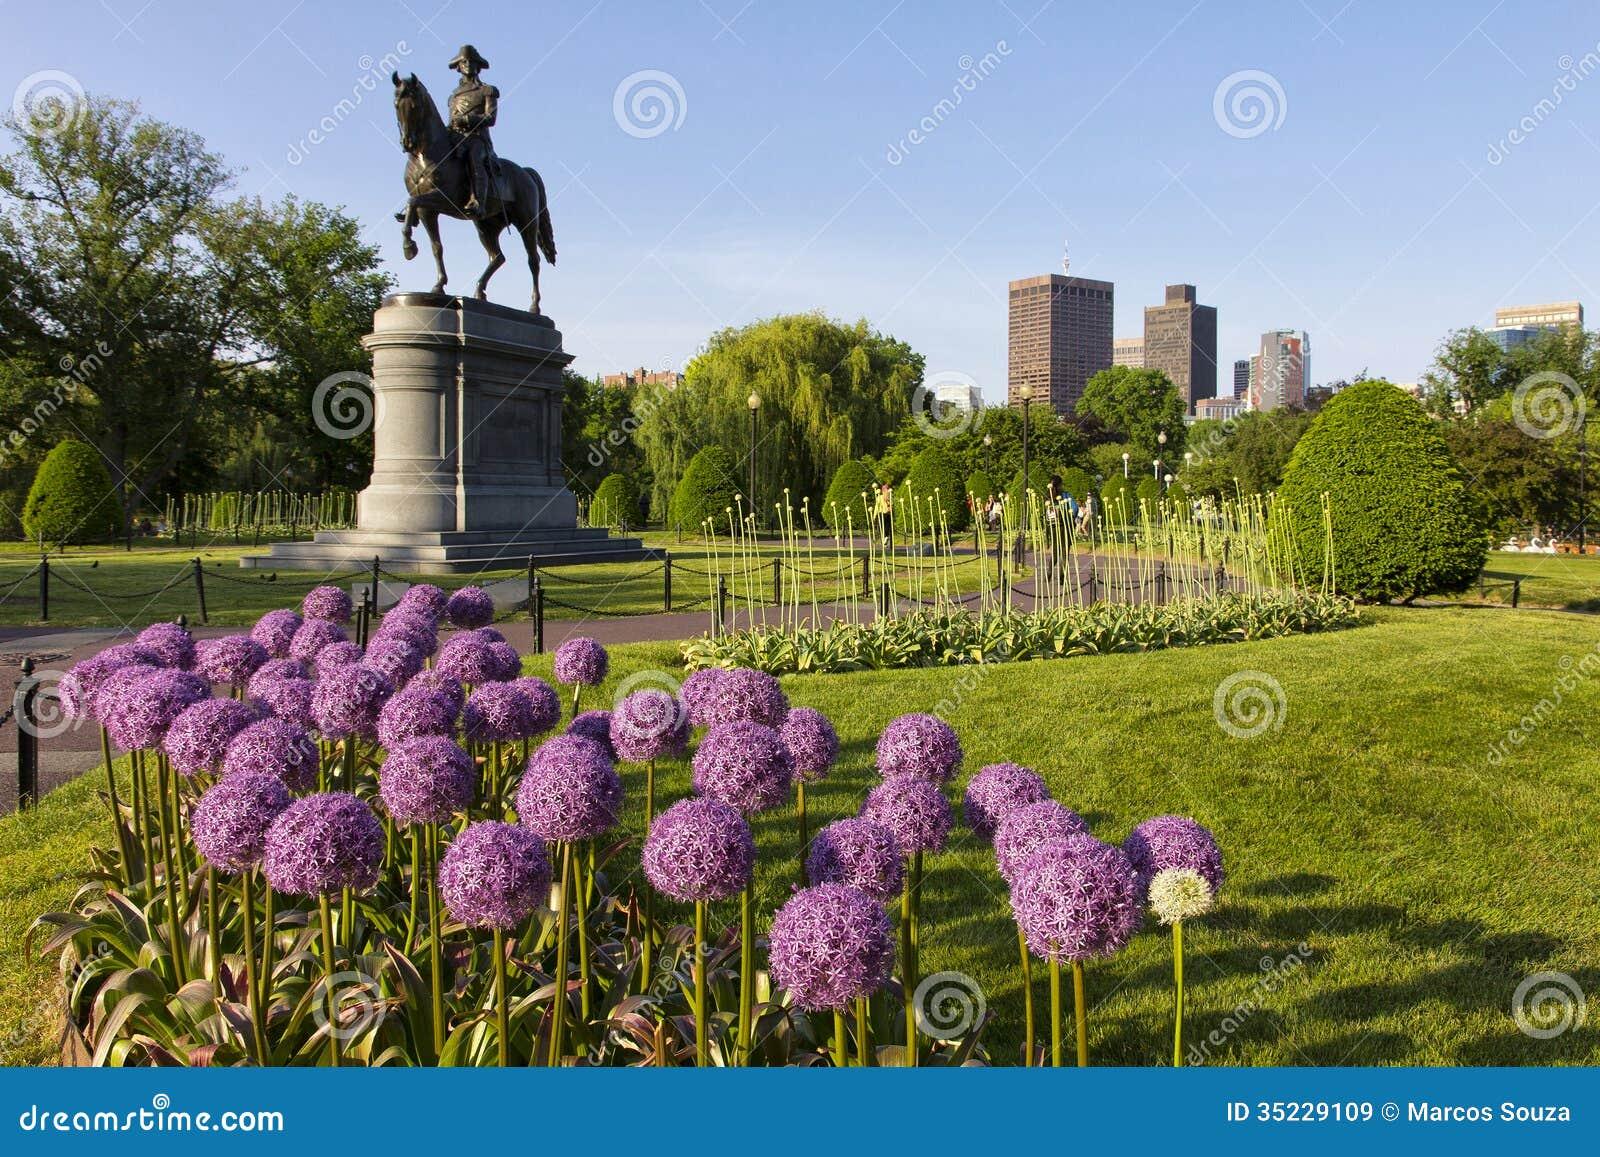 Boston Public Garden Stock Image Image Of Nature